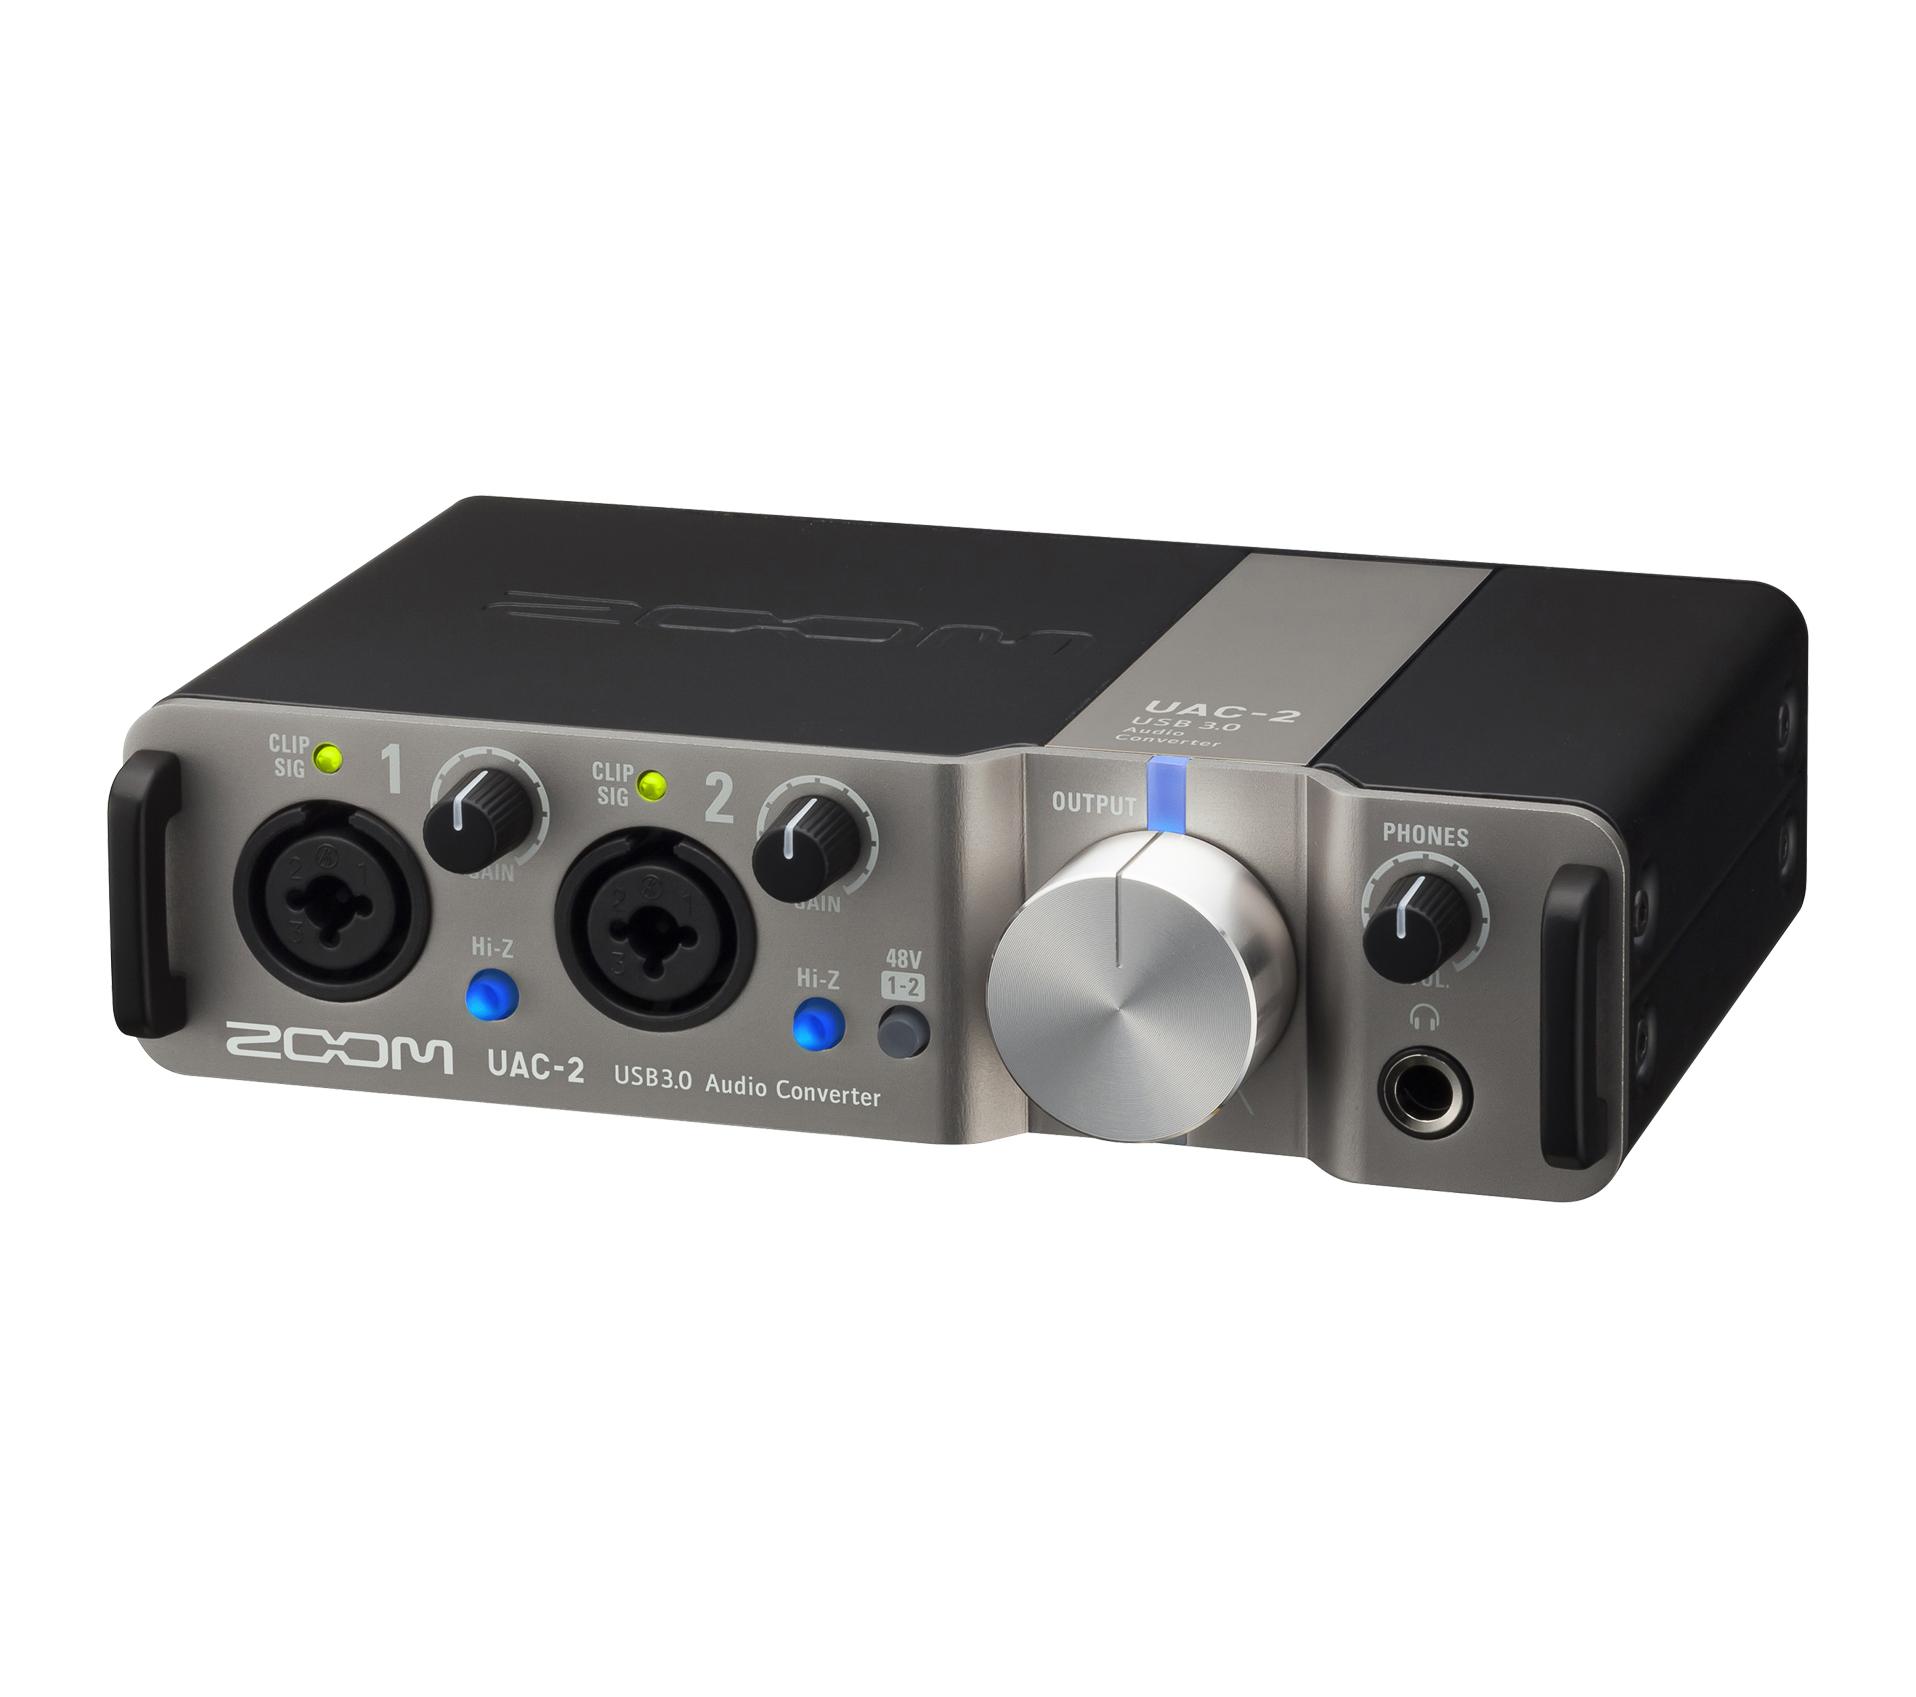 UAC-2 USB 3 0 Audio Converter | Zoom